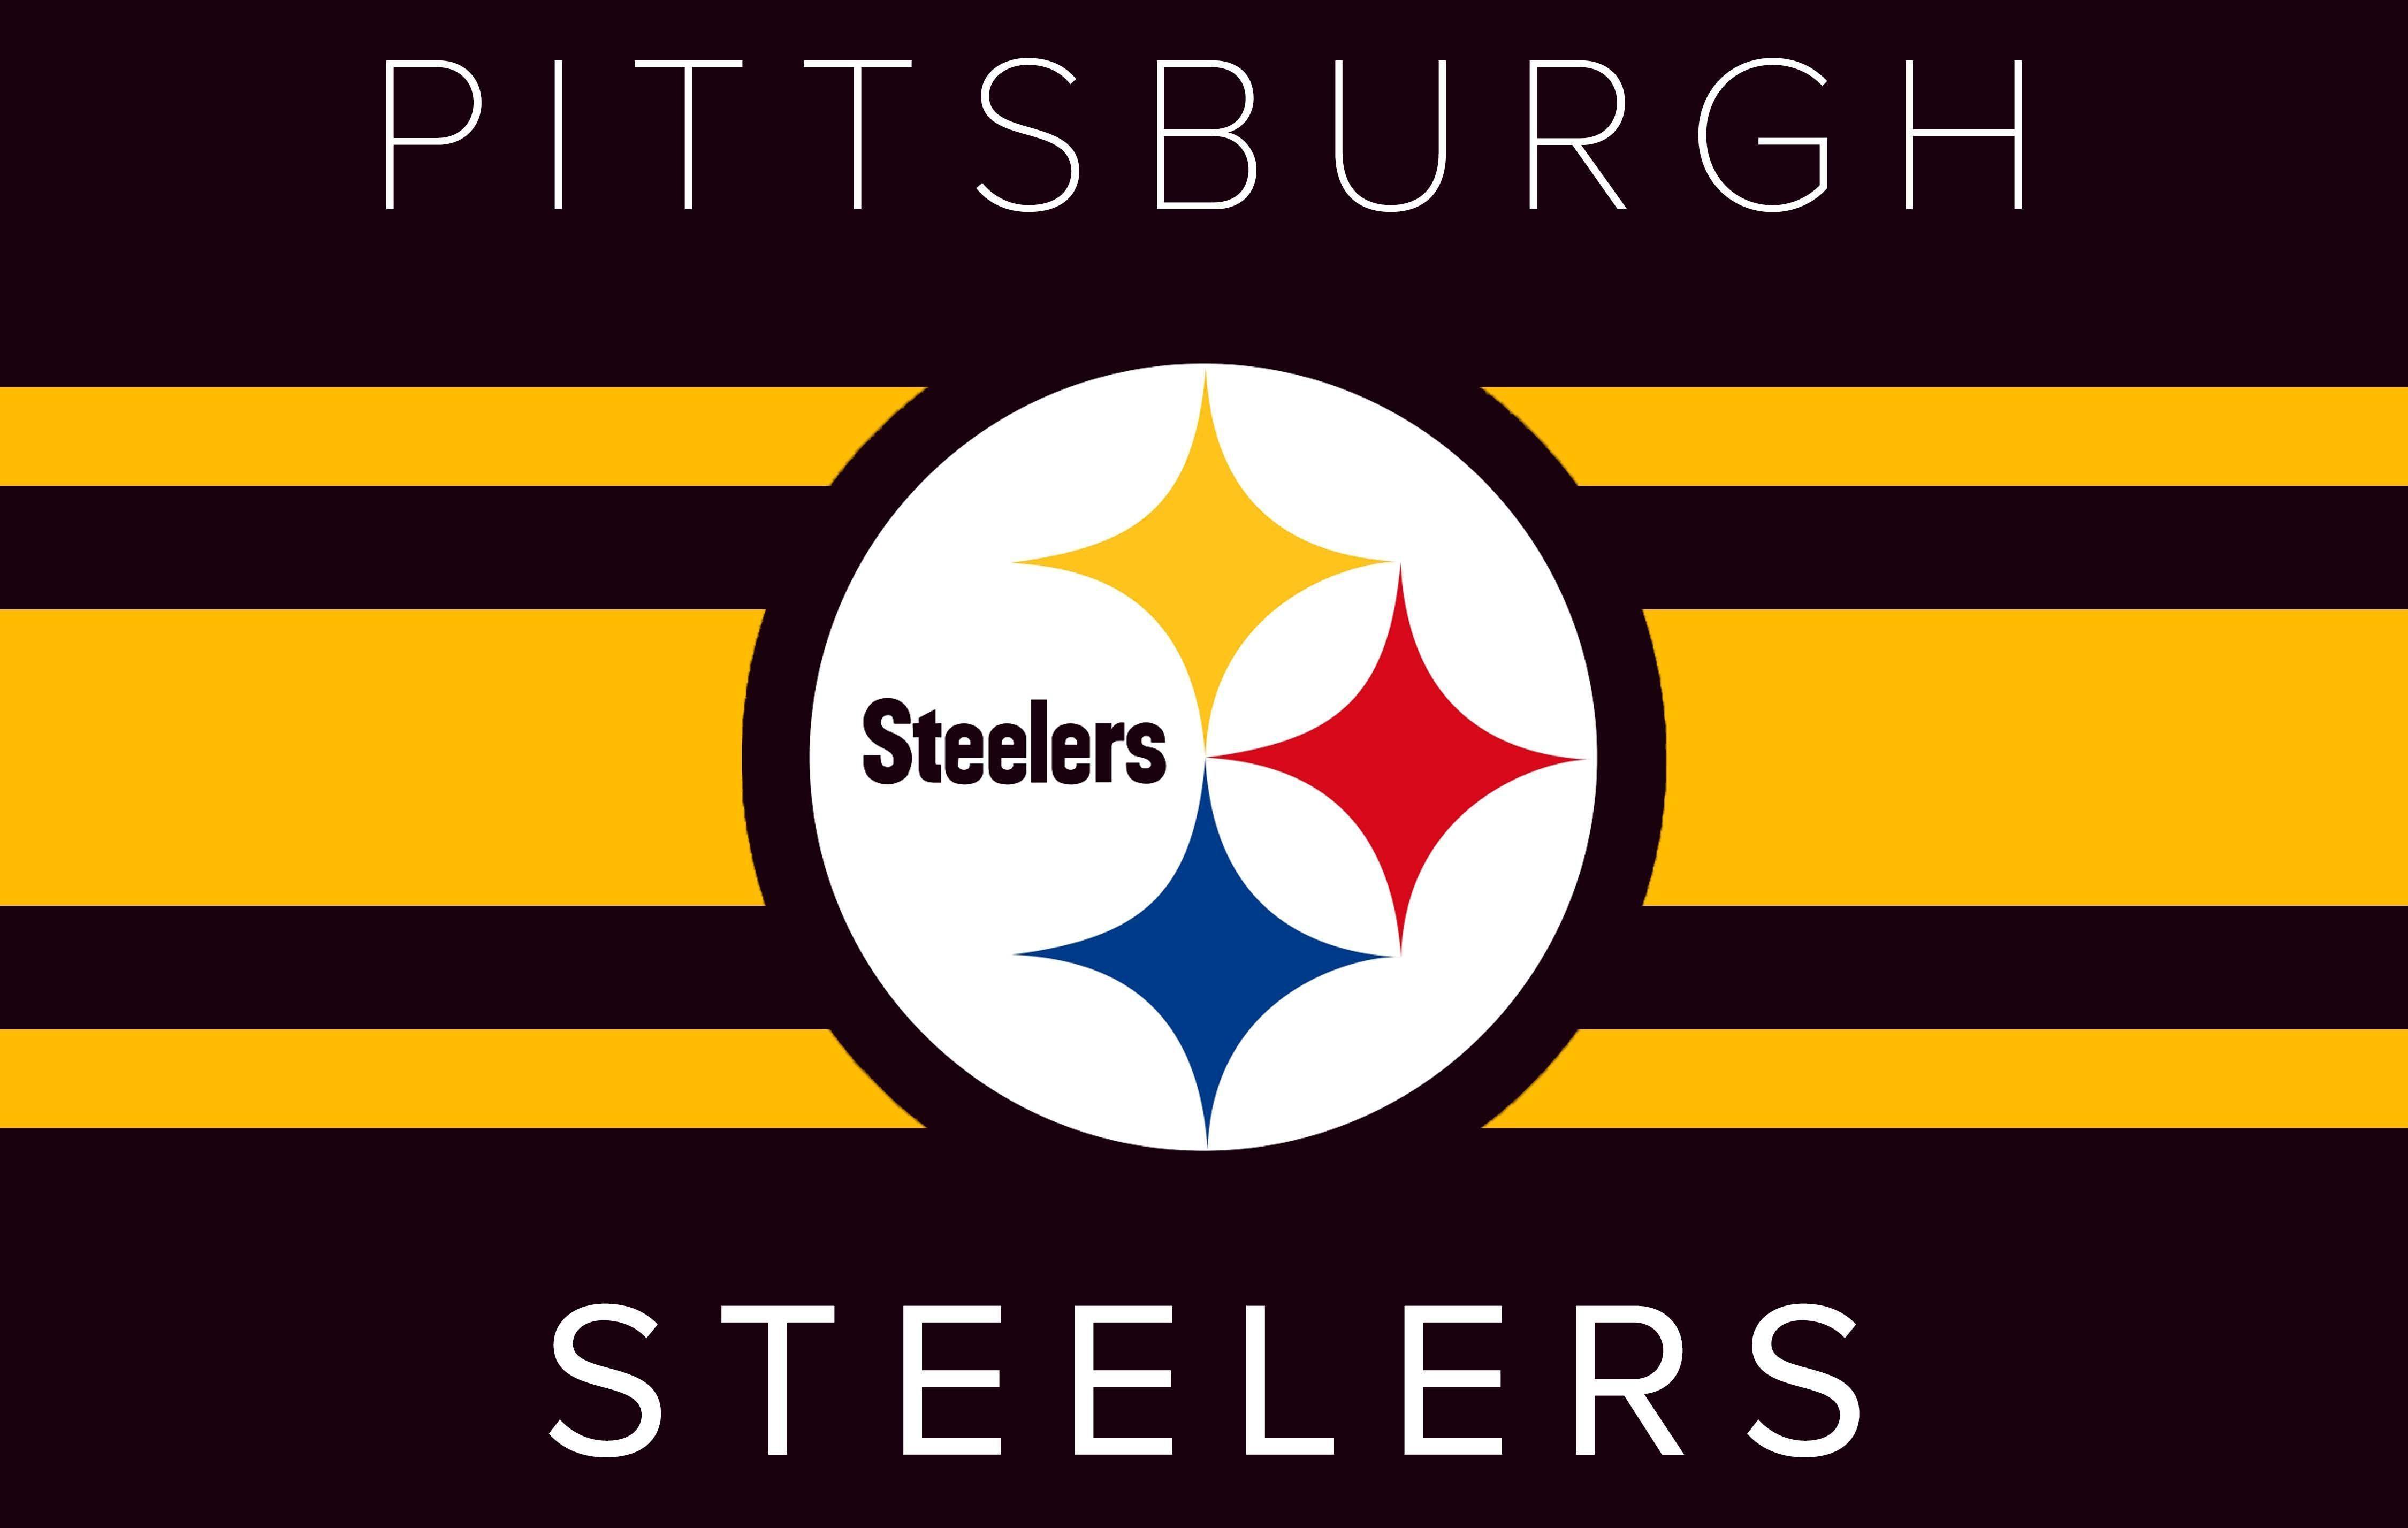 Pittsburgh Steelers Wallpapers Top Free Pittsburgh